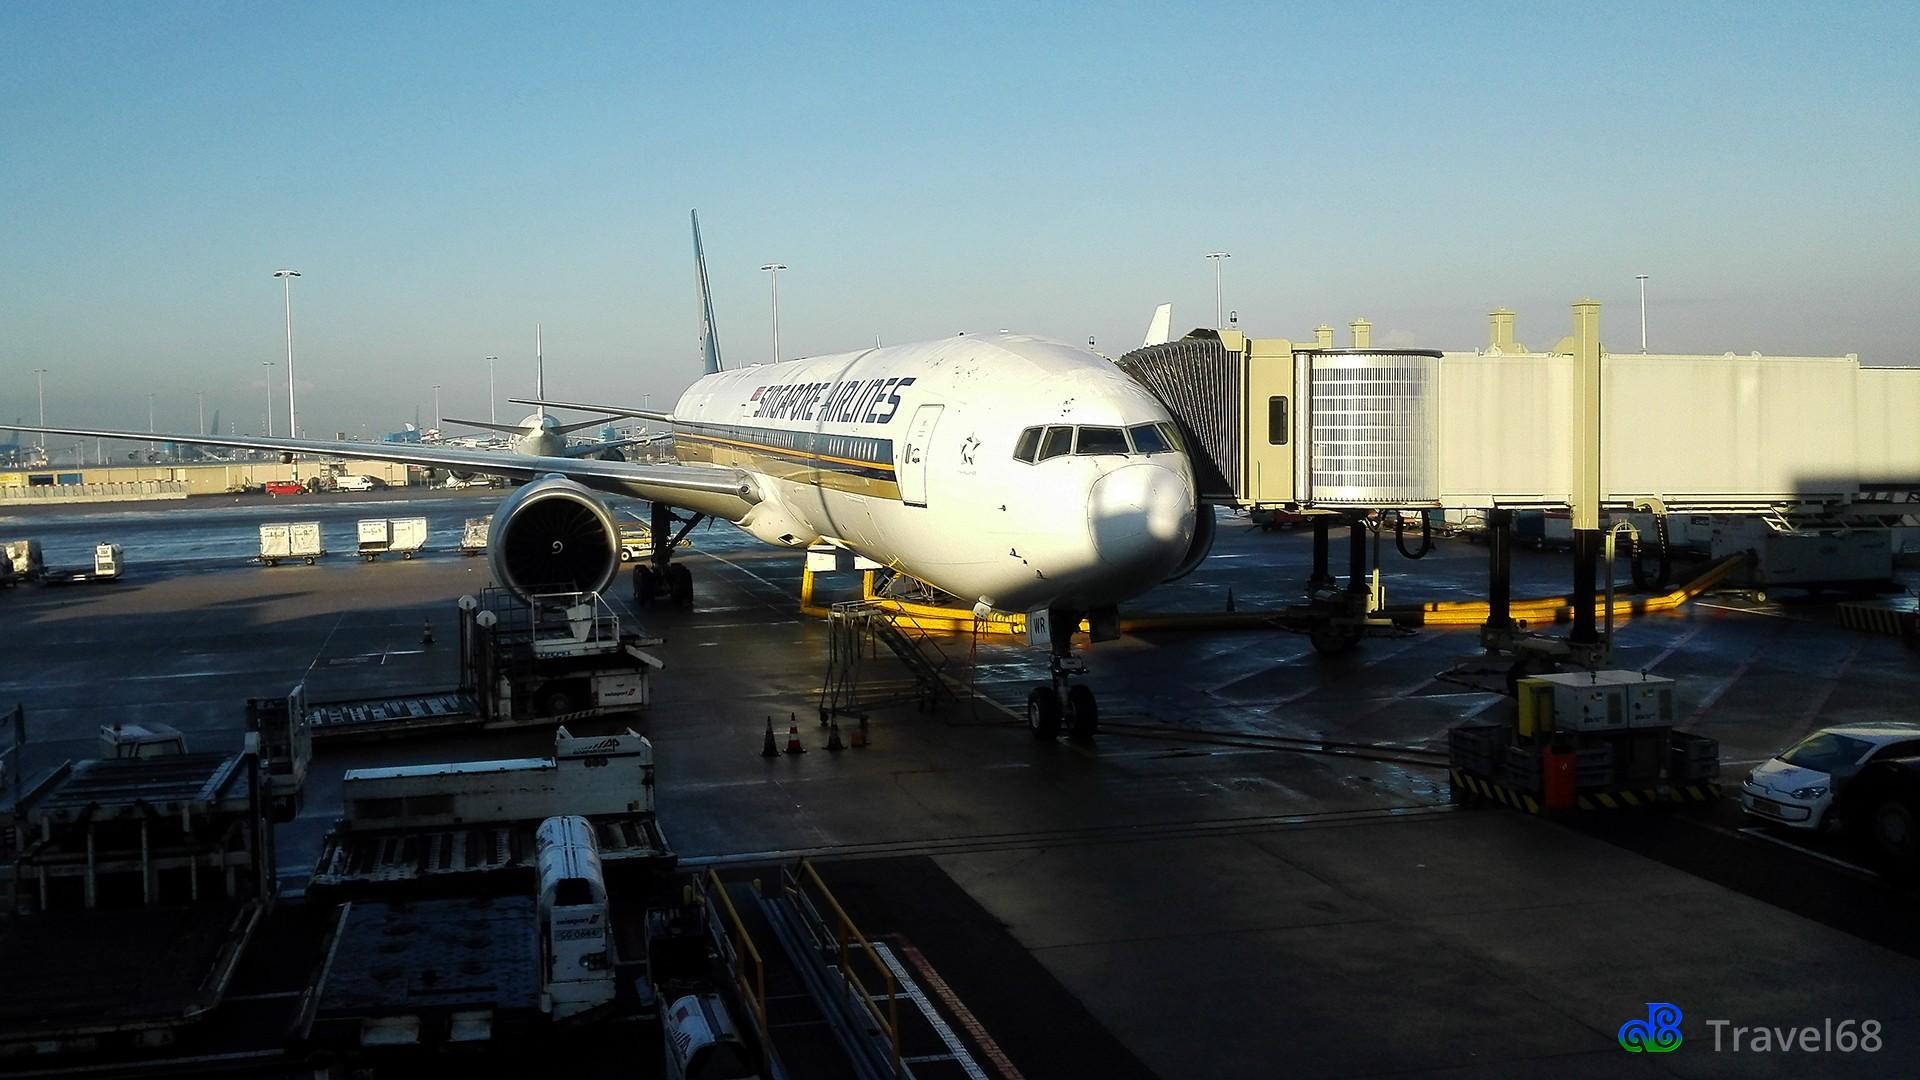 Ons vliegtuig staat al klaar